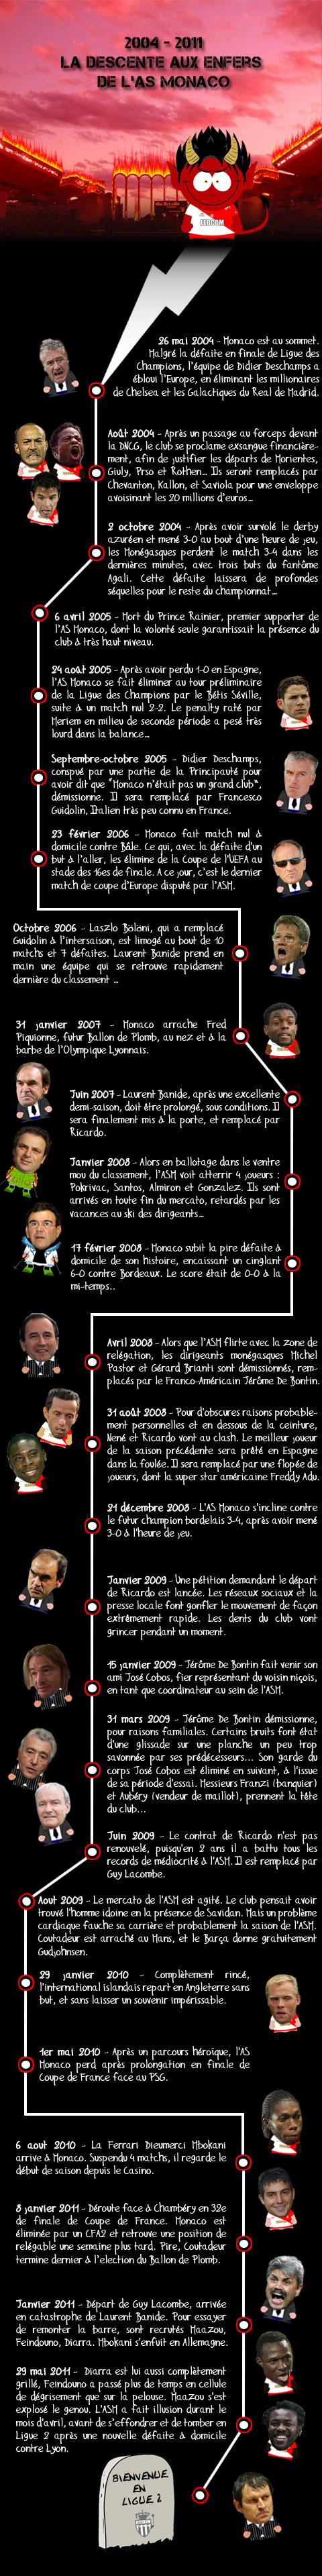 infographie_enfers_asm.jpg